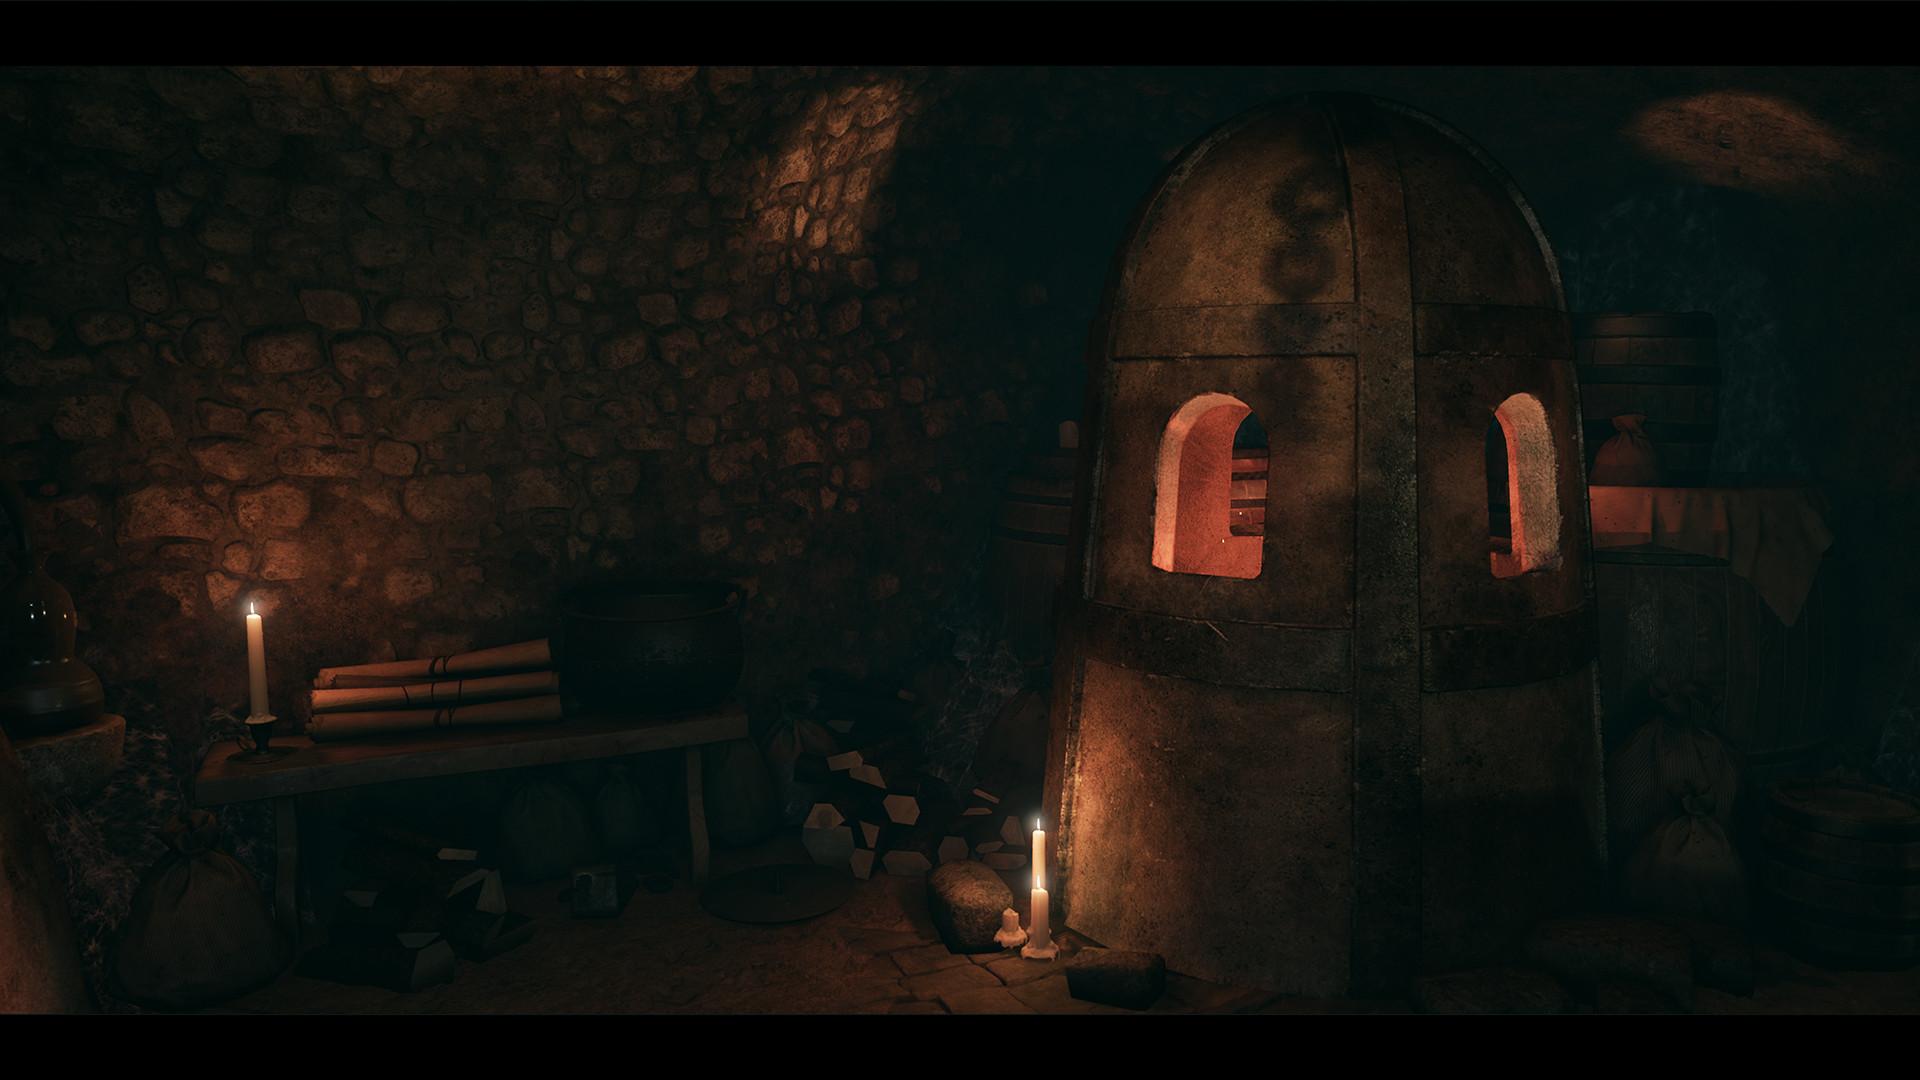 Marco maria rossi store oldalchemist screenshot 4